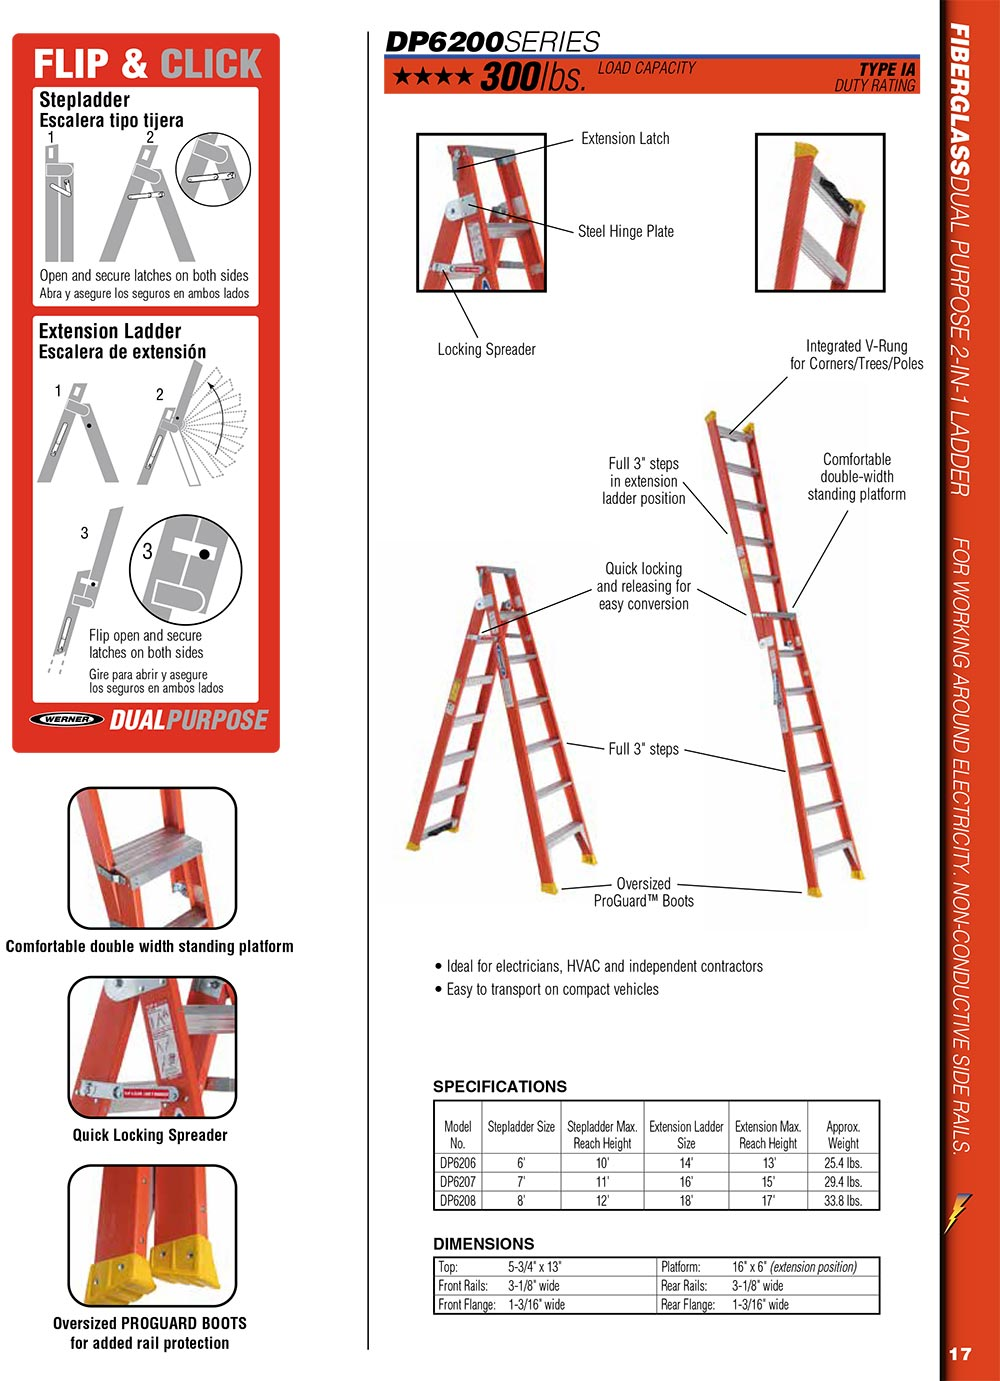 Dp6207 7 Ft Fiberglass Dual Purpose Ladder Type Ia